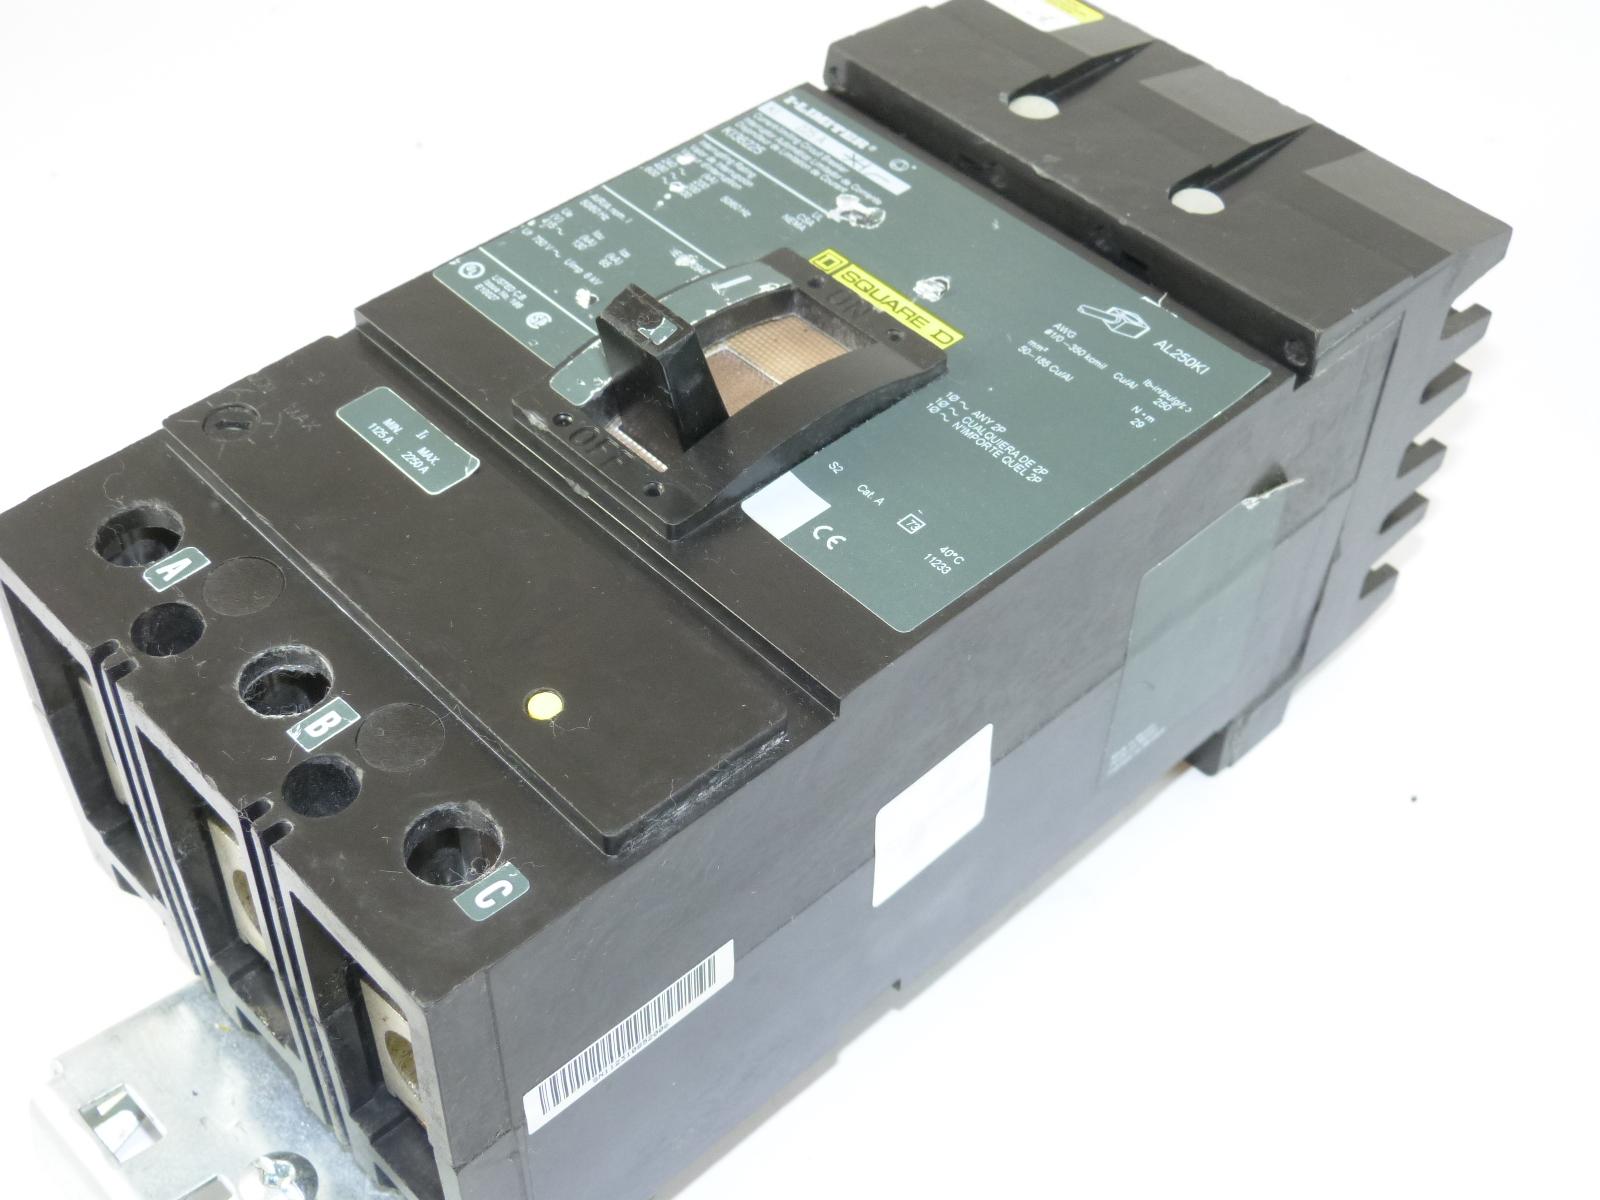 ki36225 square d circuit breaker new used and obsolete rh westcoastpower com